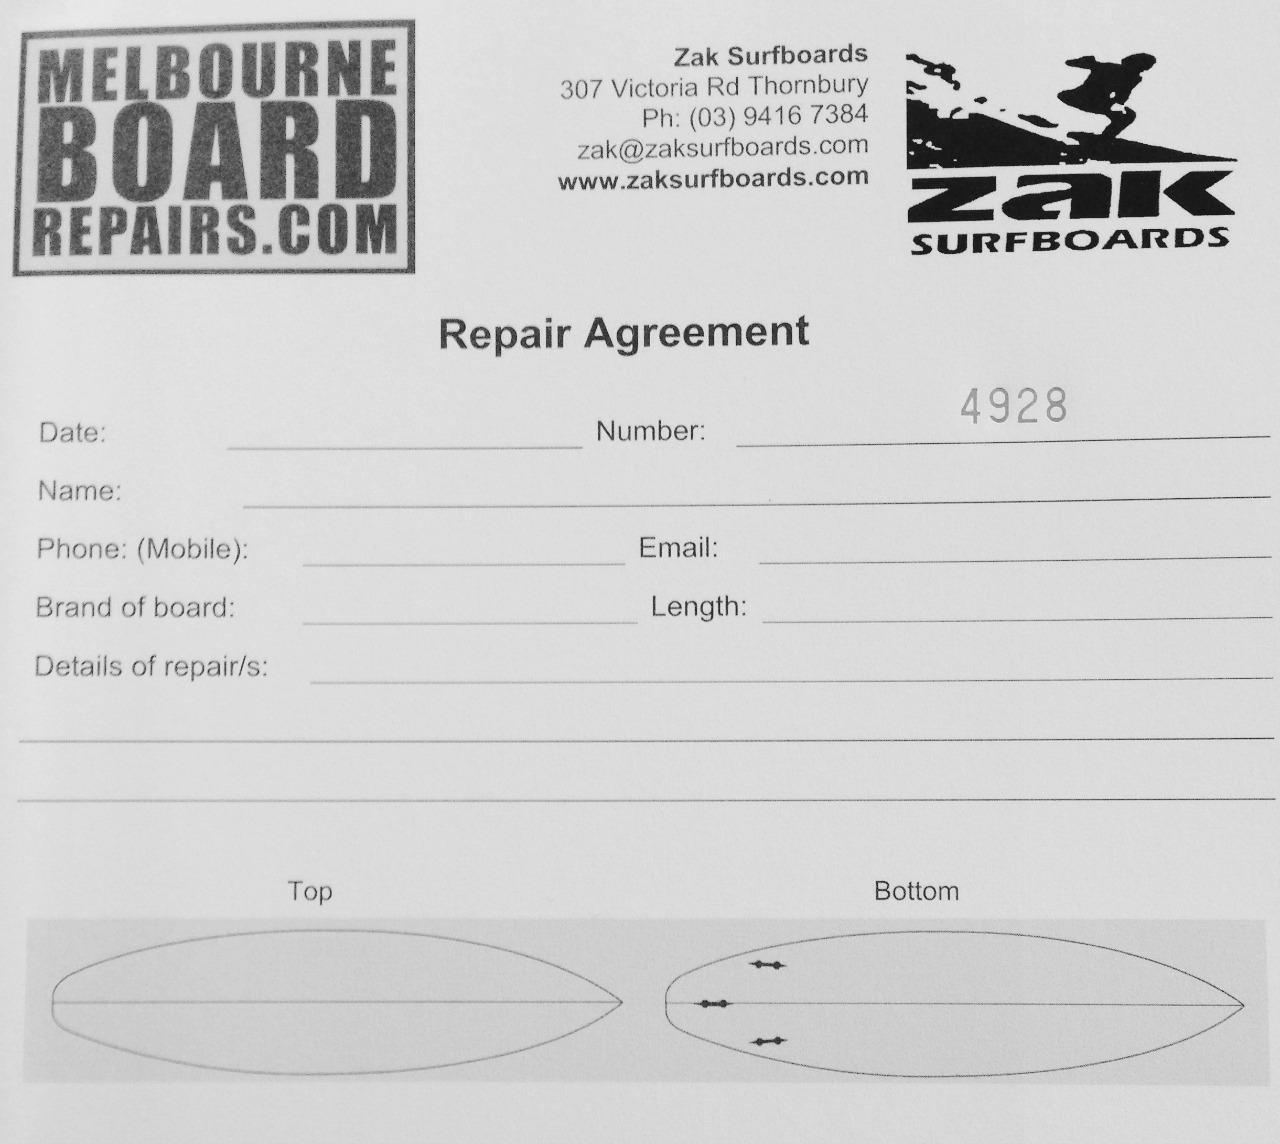 Surfboard Repairs Melbourne